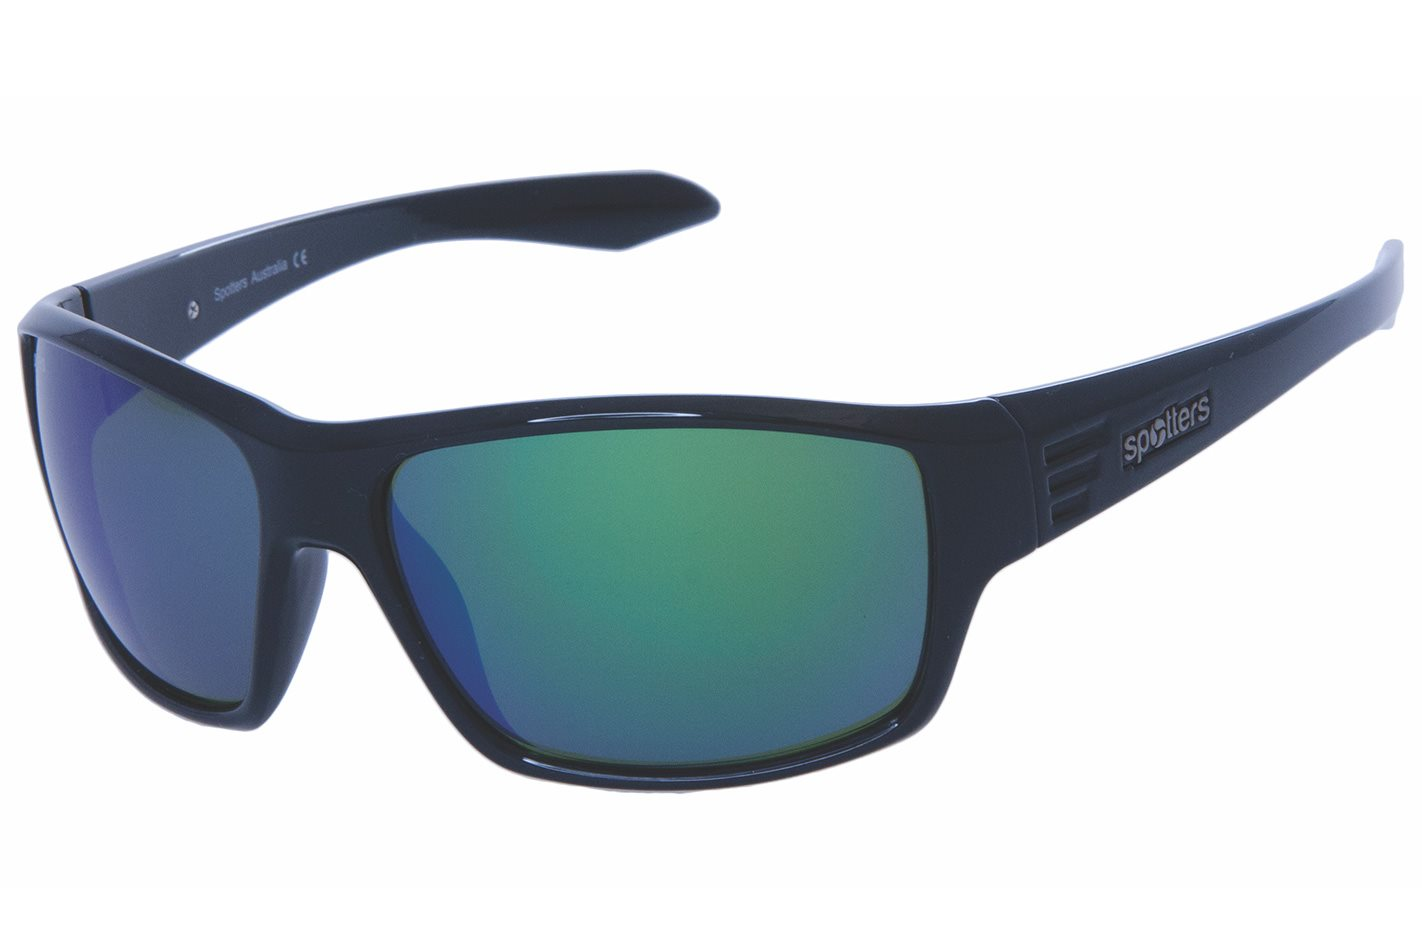 Spotters Blaze Nexus Mirror sunglasses